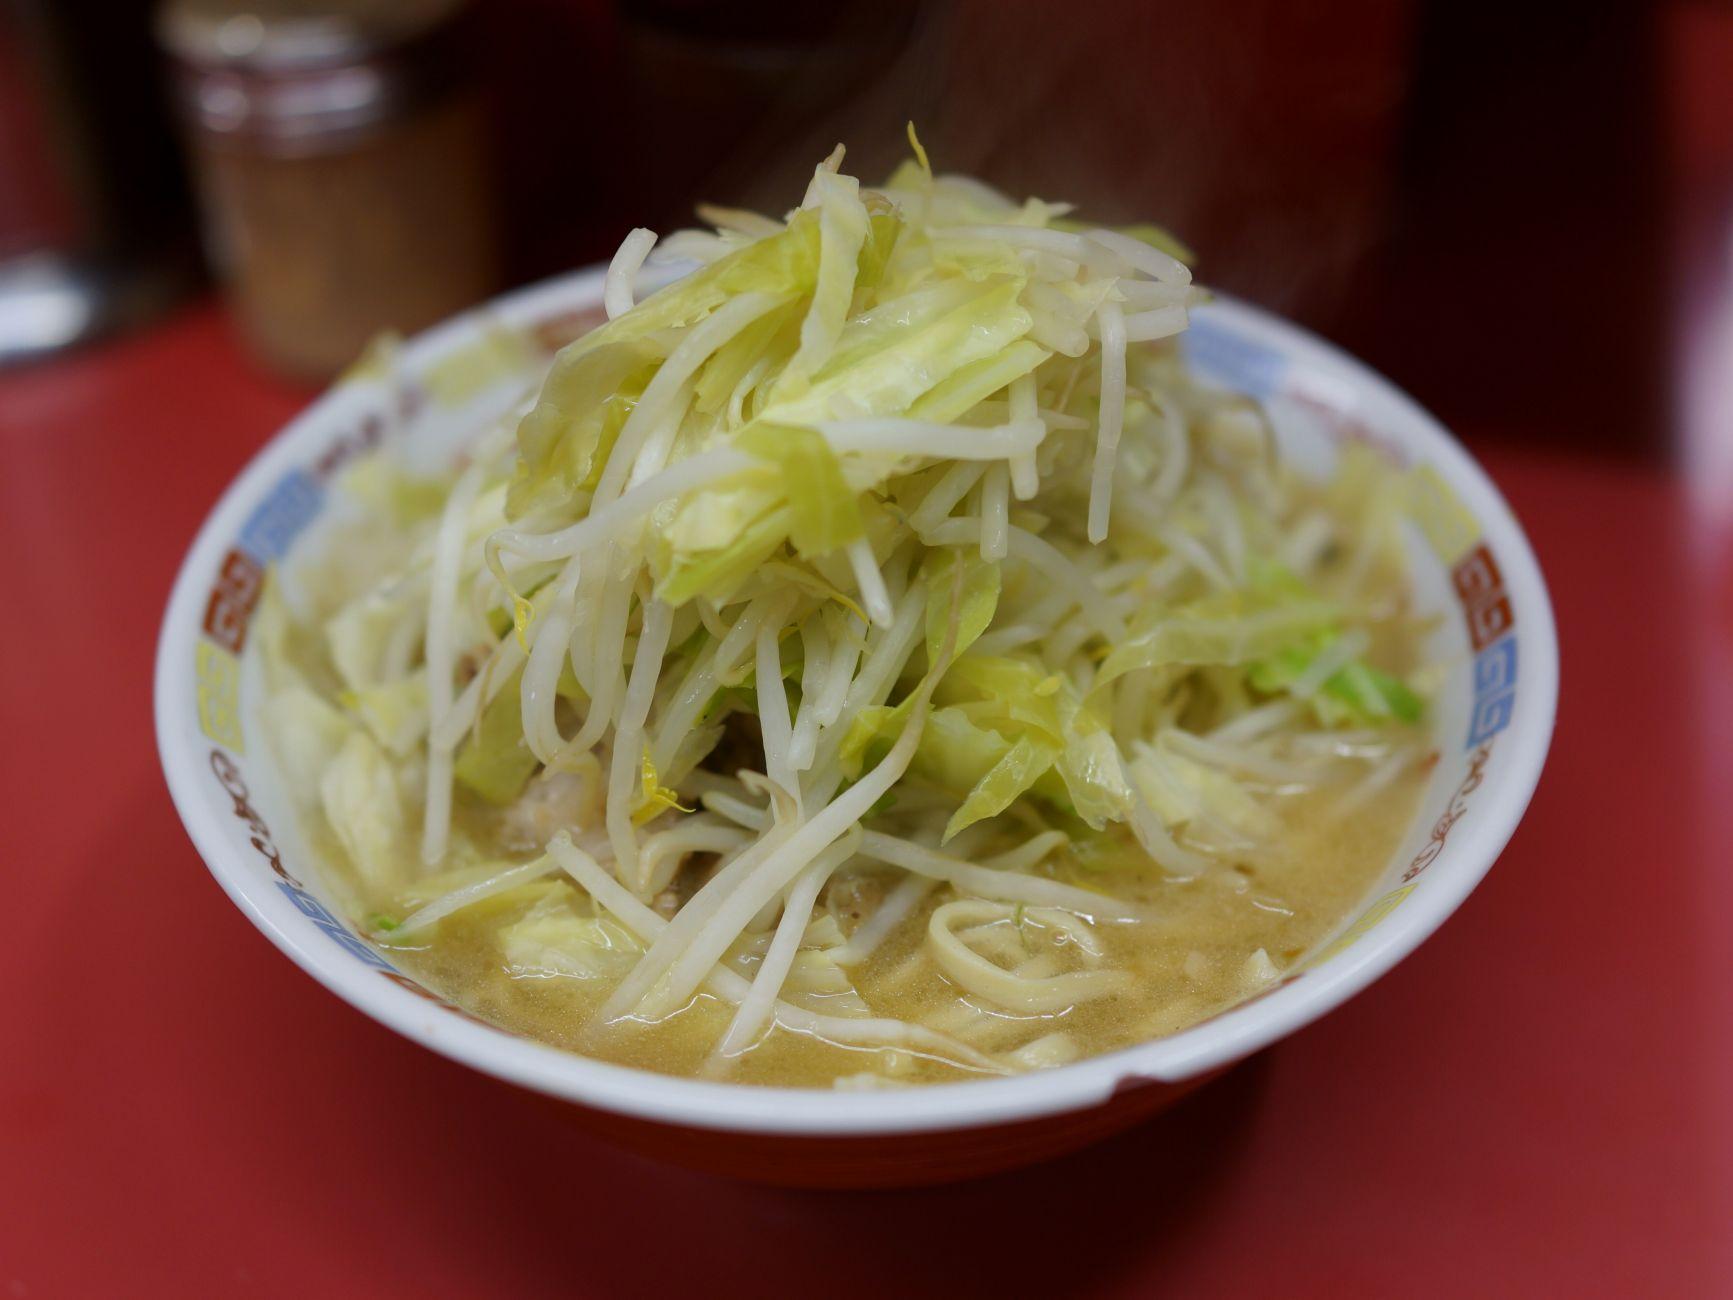 20121212002hibari.jpg